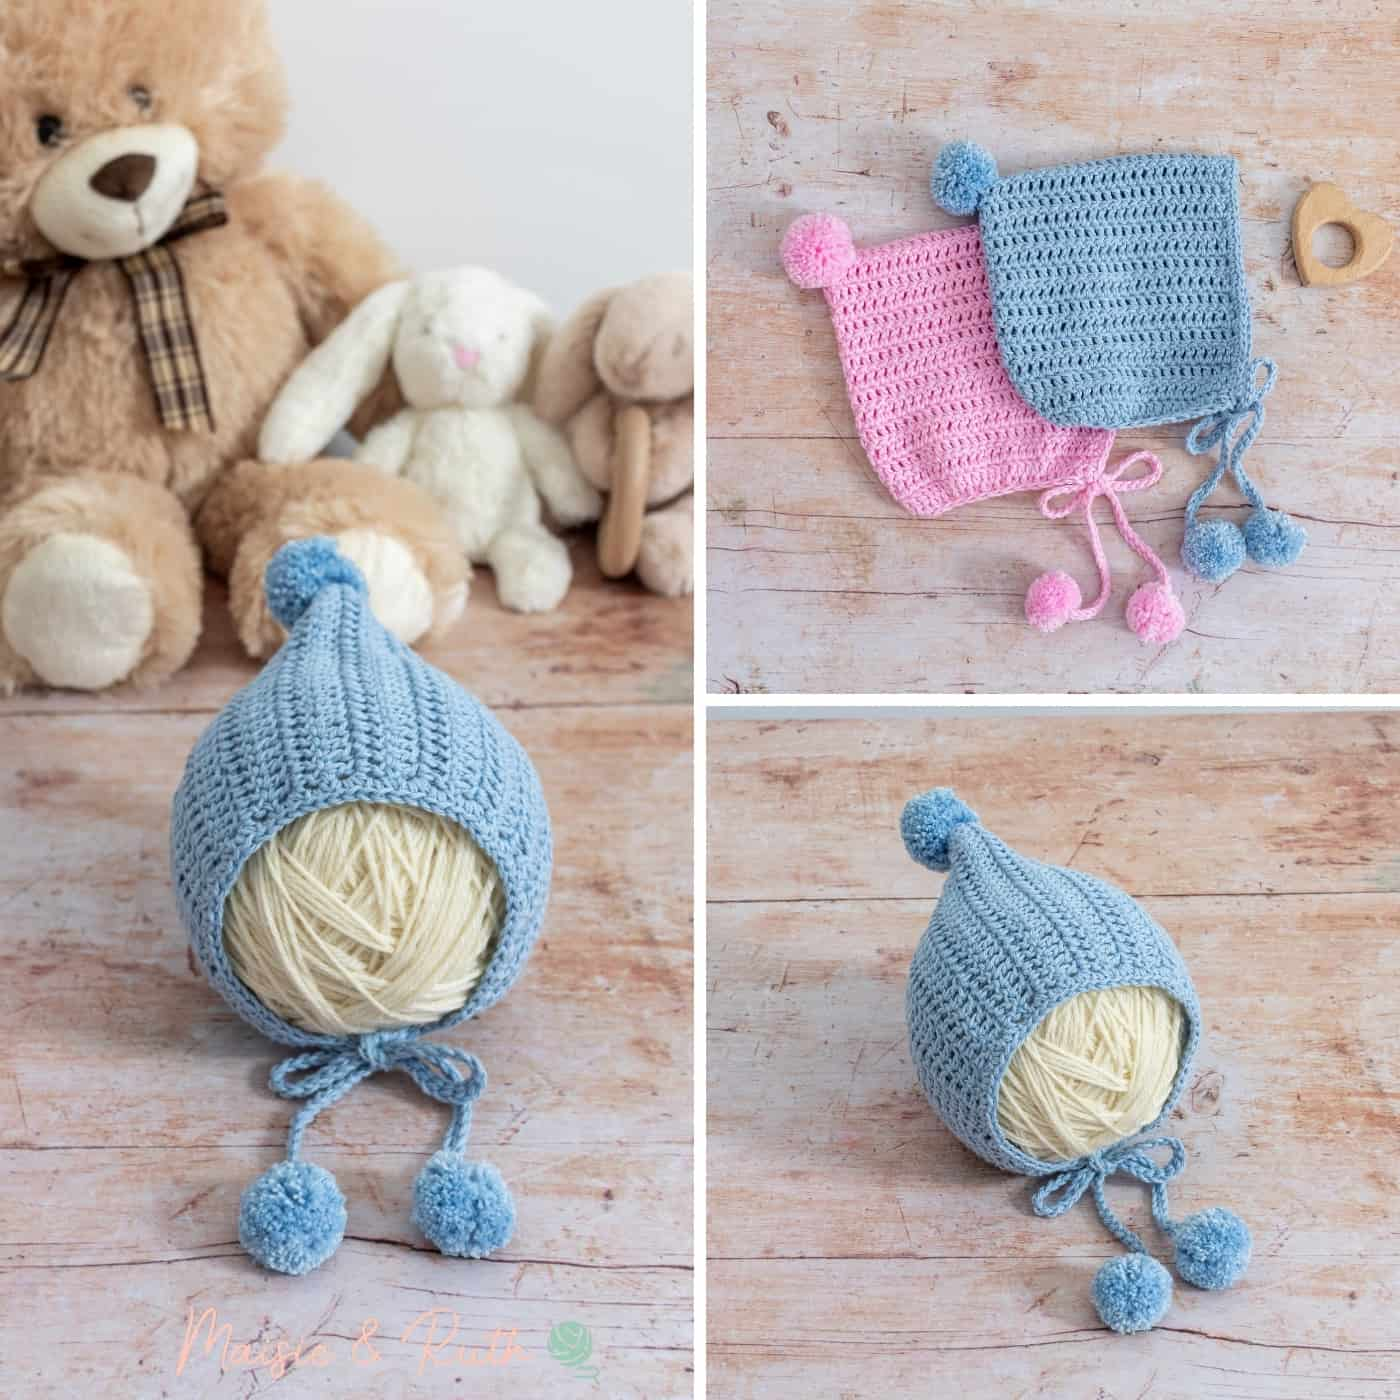 Easy Crochet Baby Bonnet Pattern Collage Photo v.2